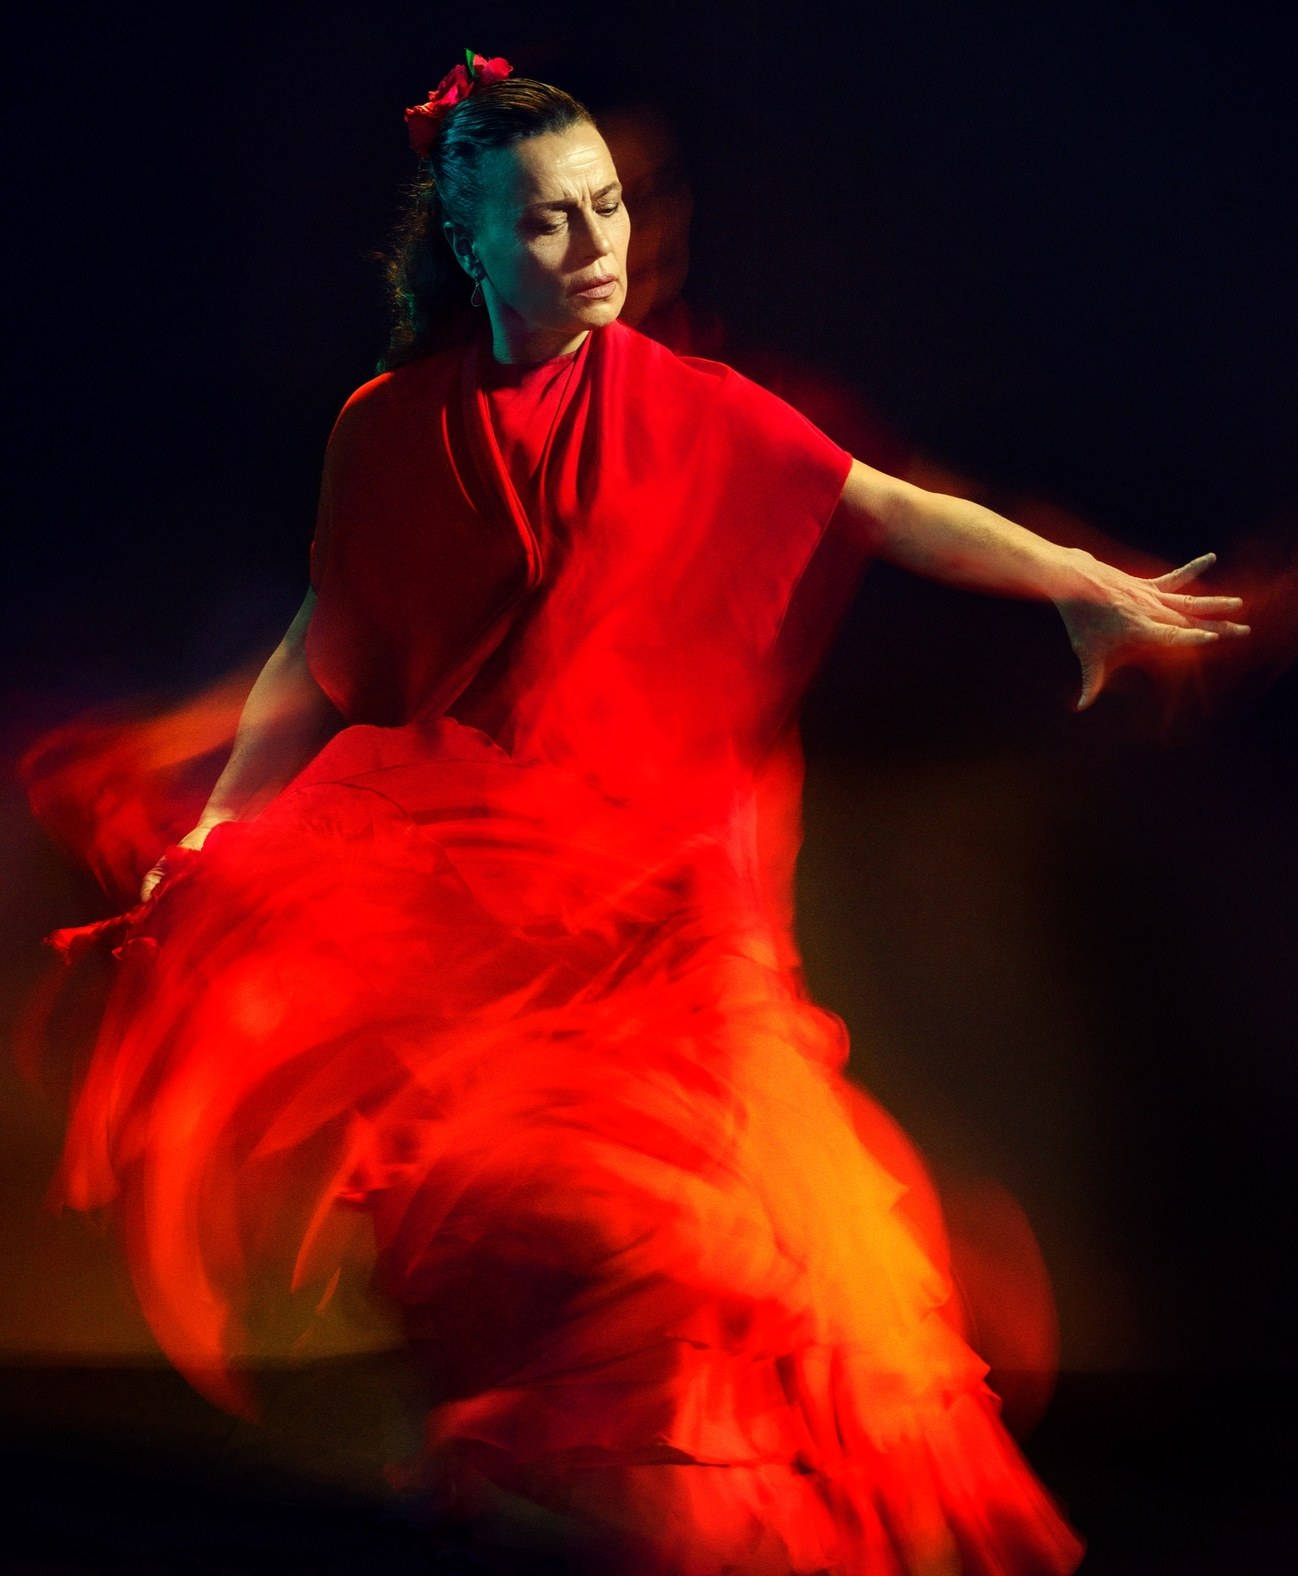 Pari Dukovic Captures Flamenco Dancer Soledad Barrio for The New Yorker